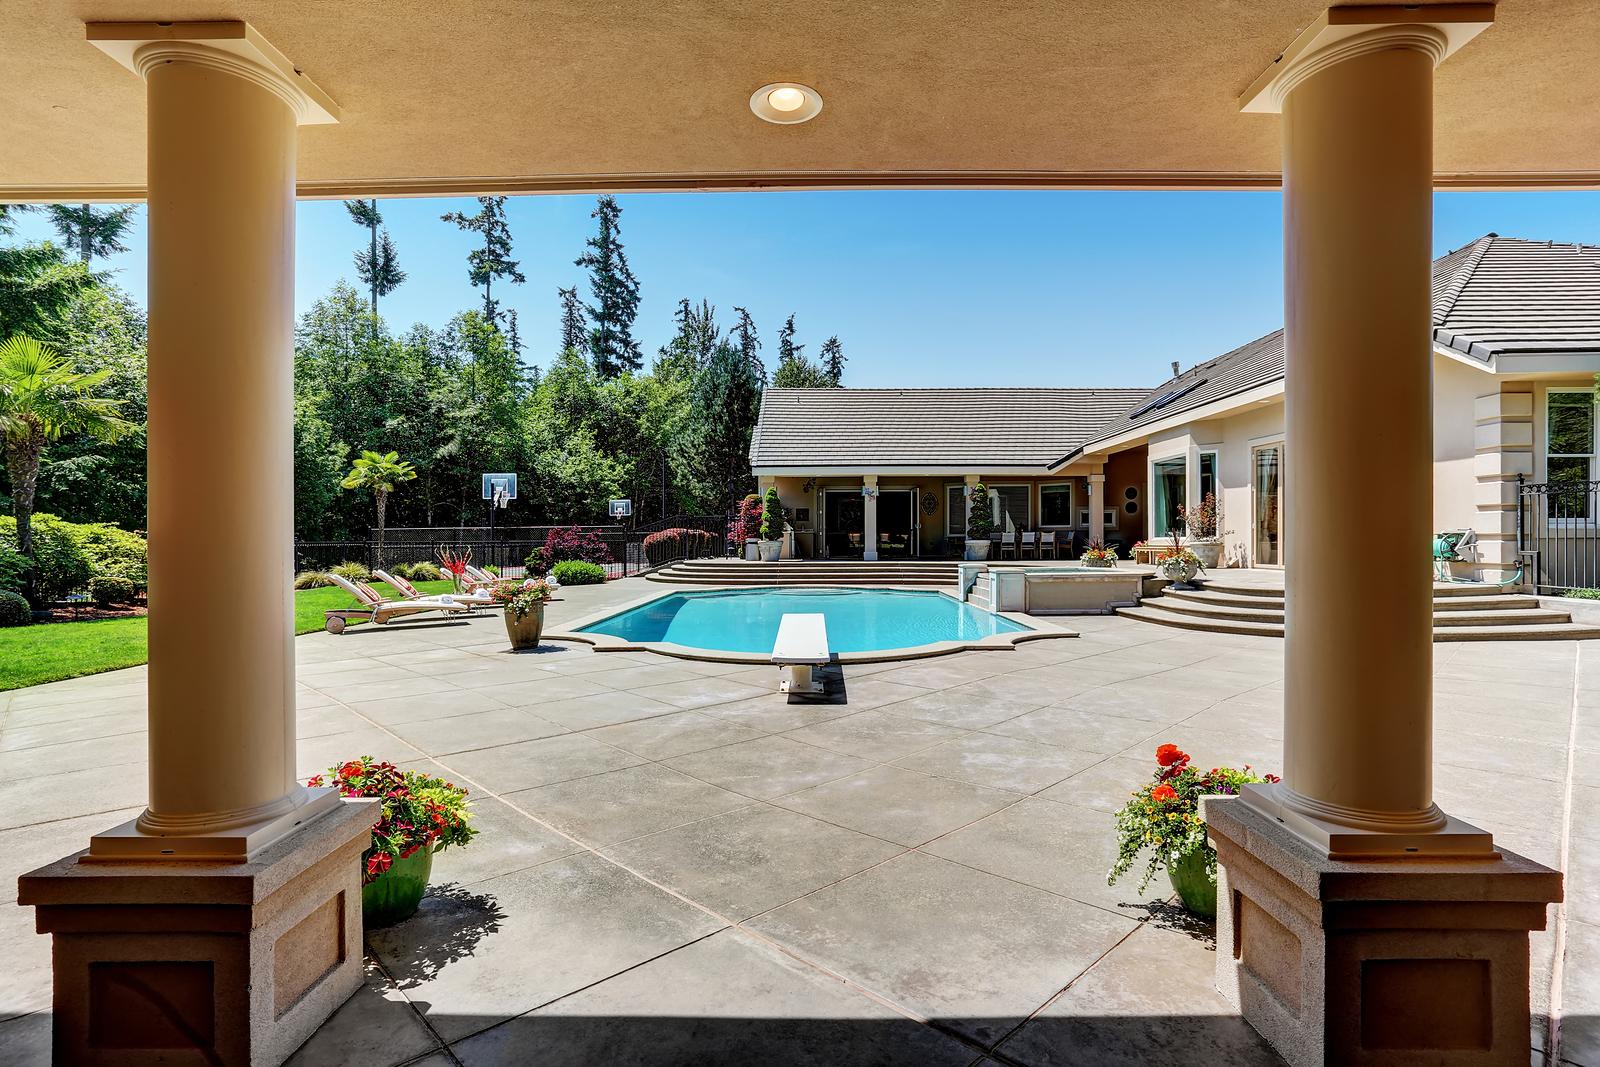 bigstock-Modern-Backyard-With-Swimming--148139303.jpg